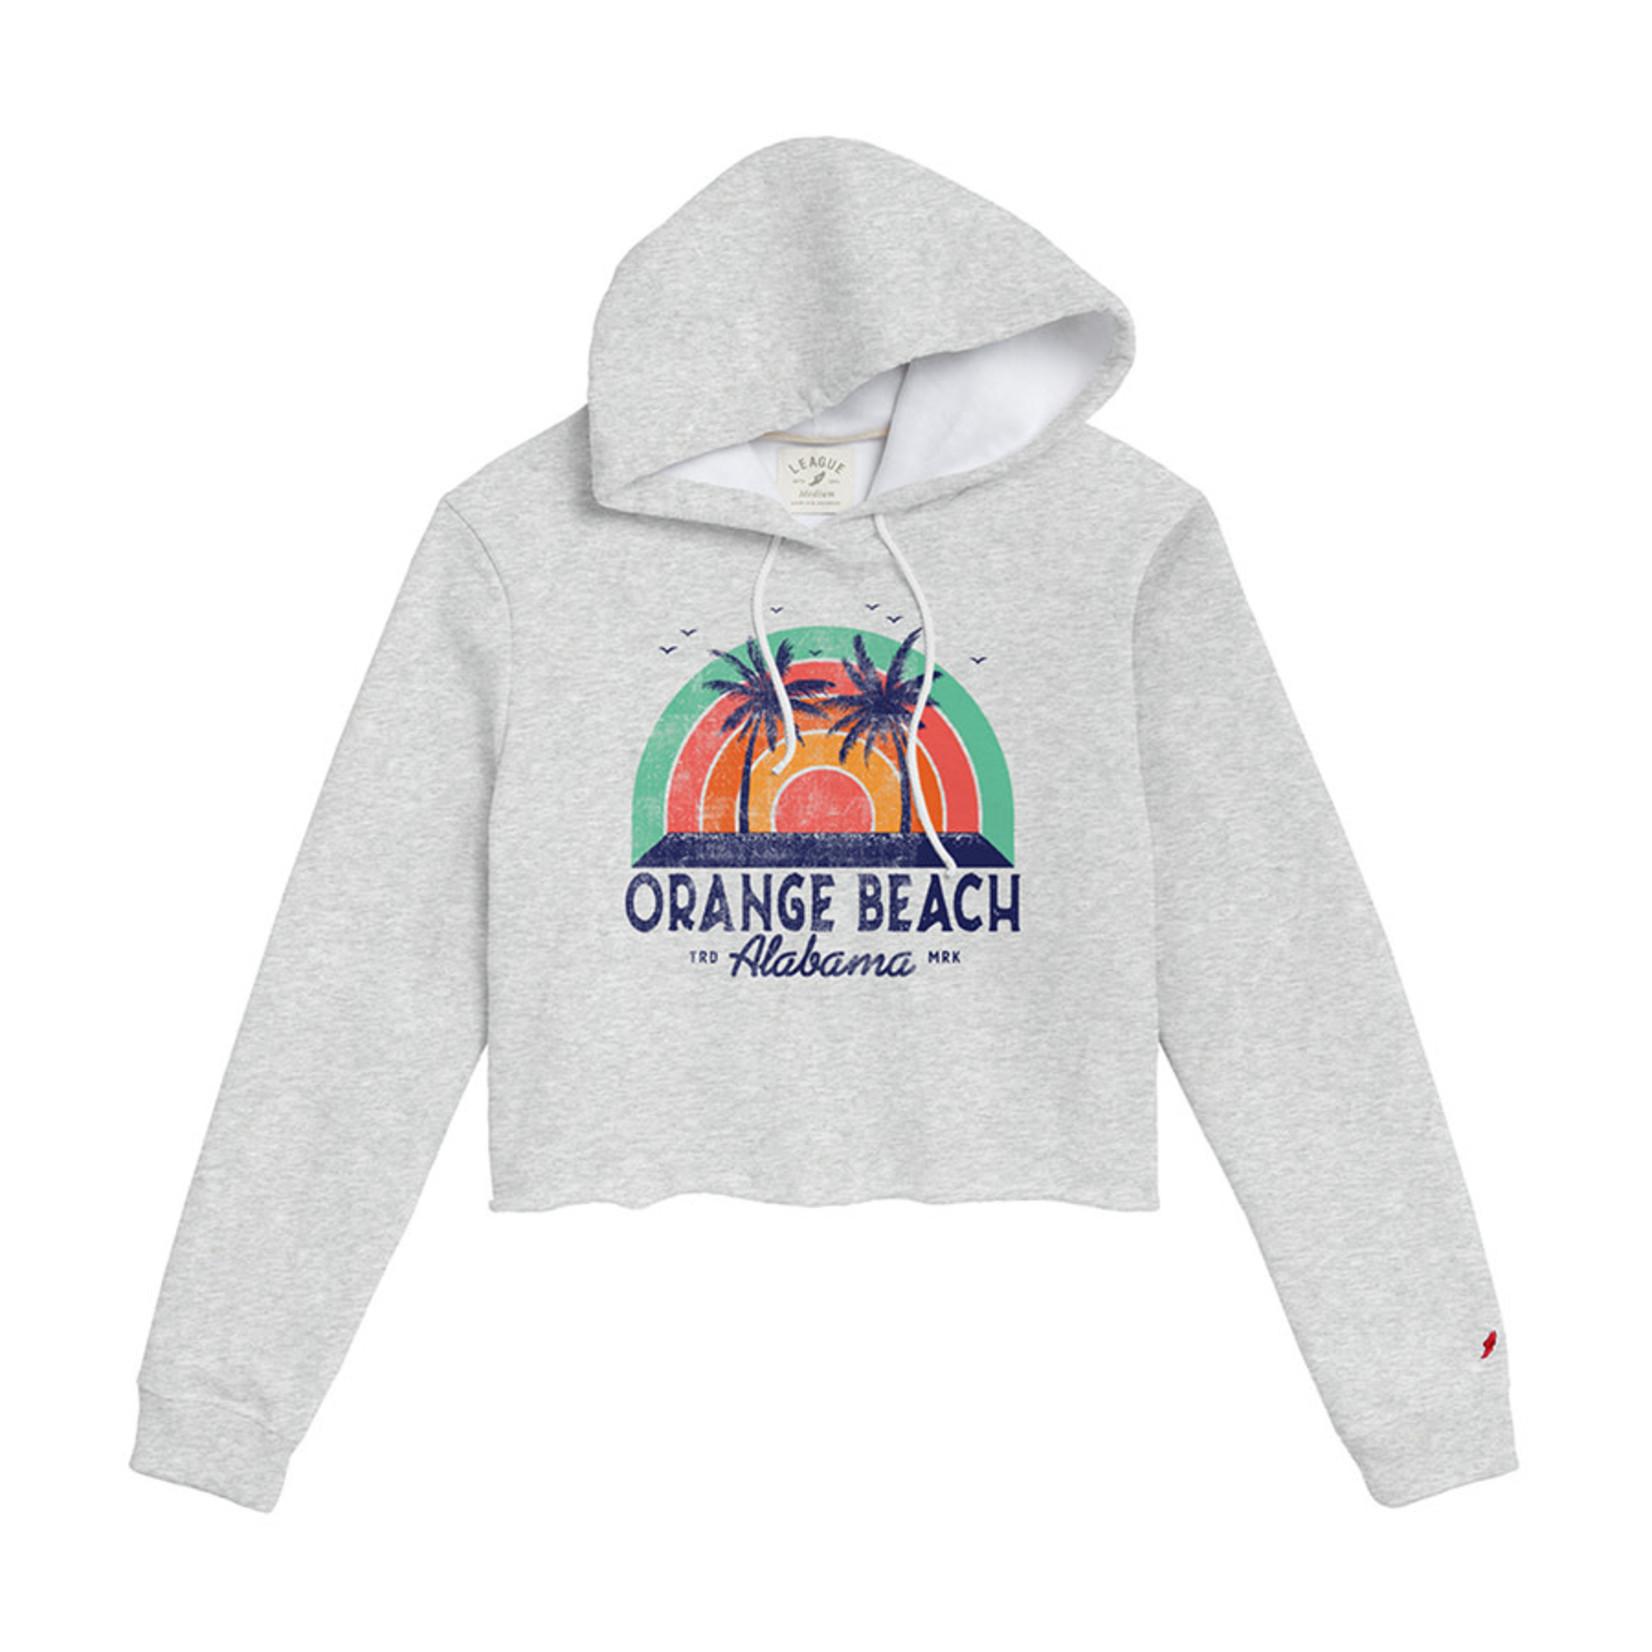 L2 Brands Palm City Hooded Crop